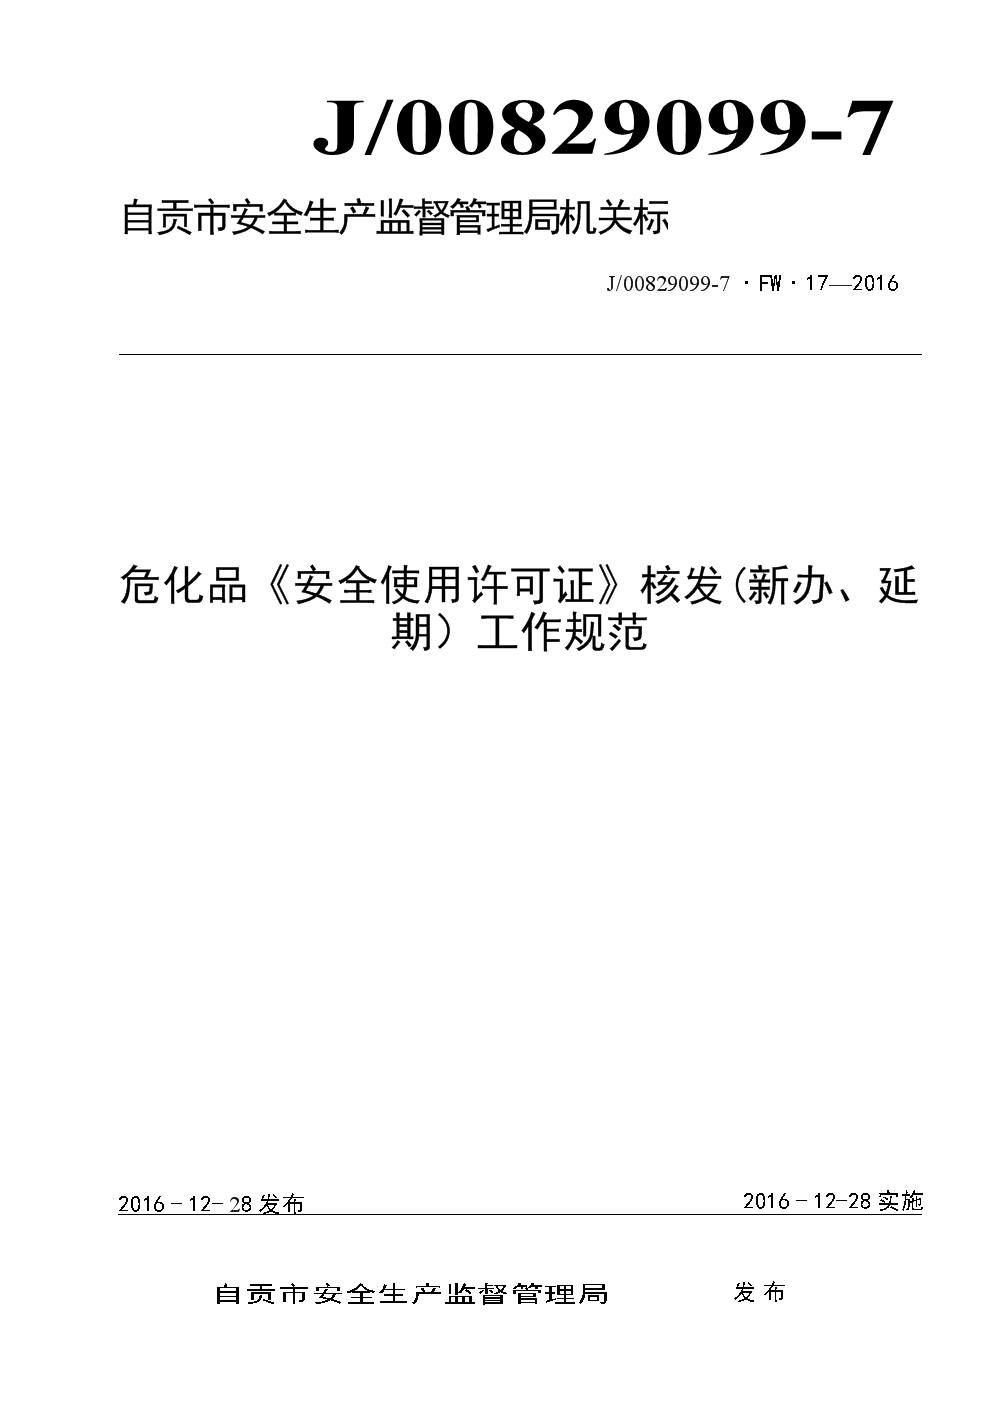 J00829099-7危化品《安全使用许可证》核发(新办、延期)工作规范.doc